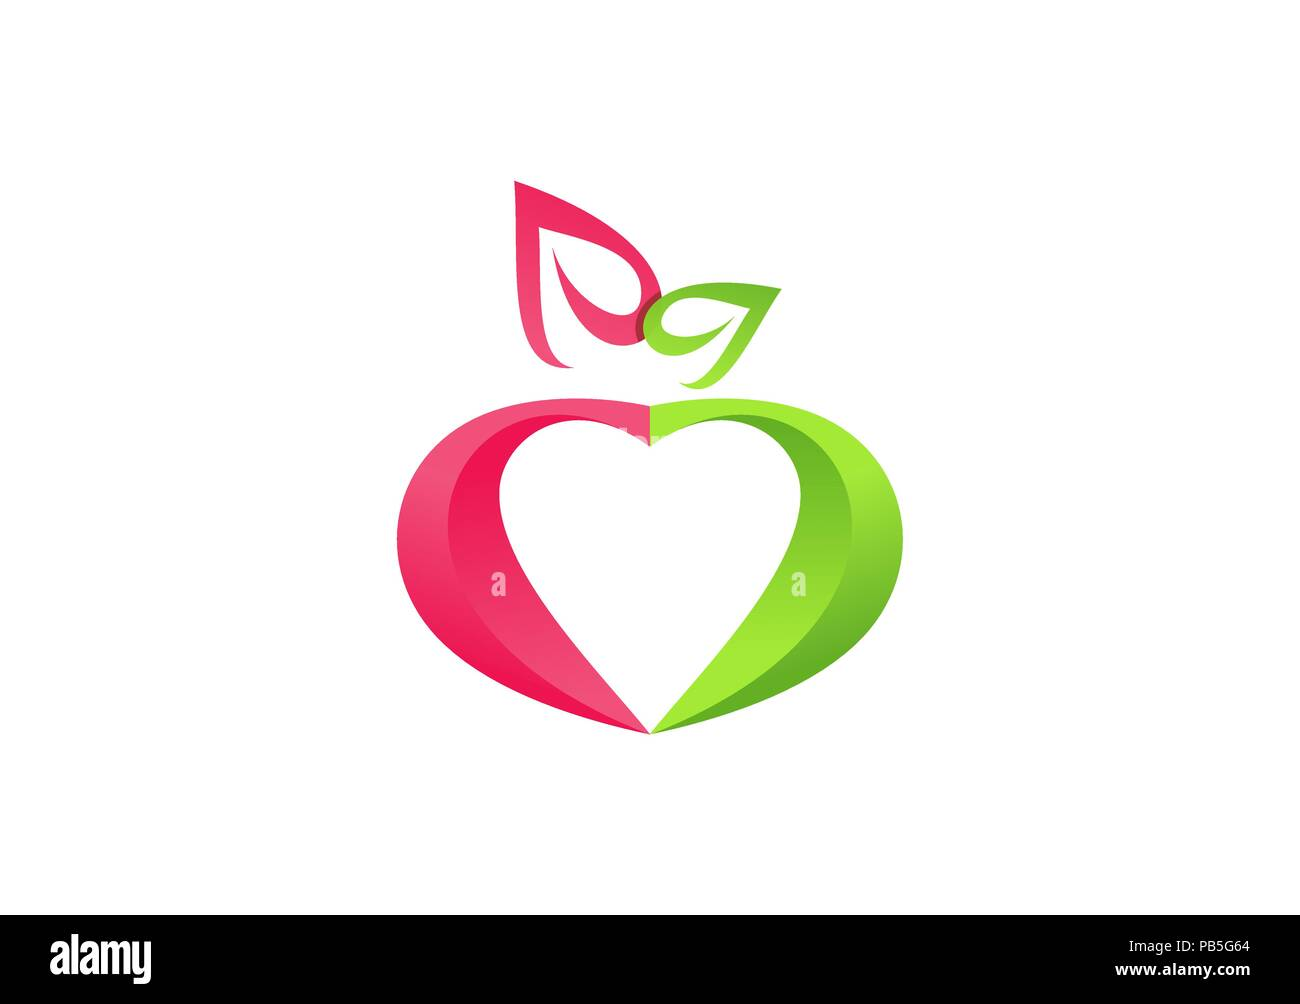 Fresh Fruit Healthy Heart Logo Wellness Health Apple Heart Symbol